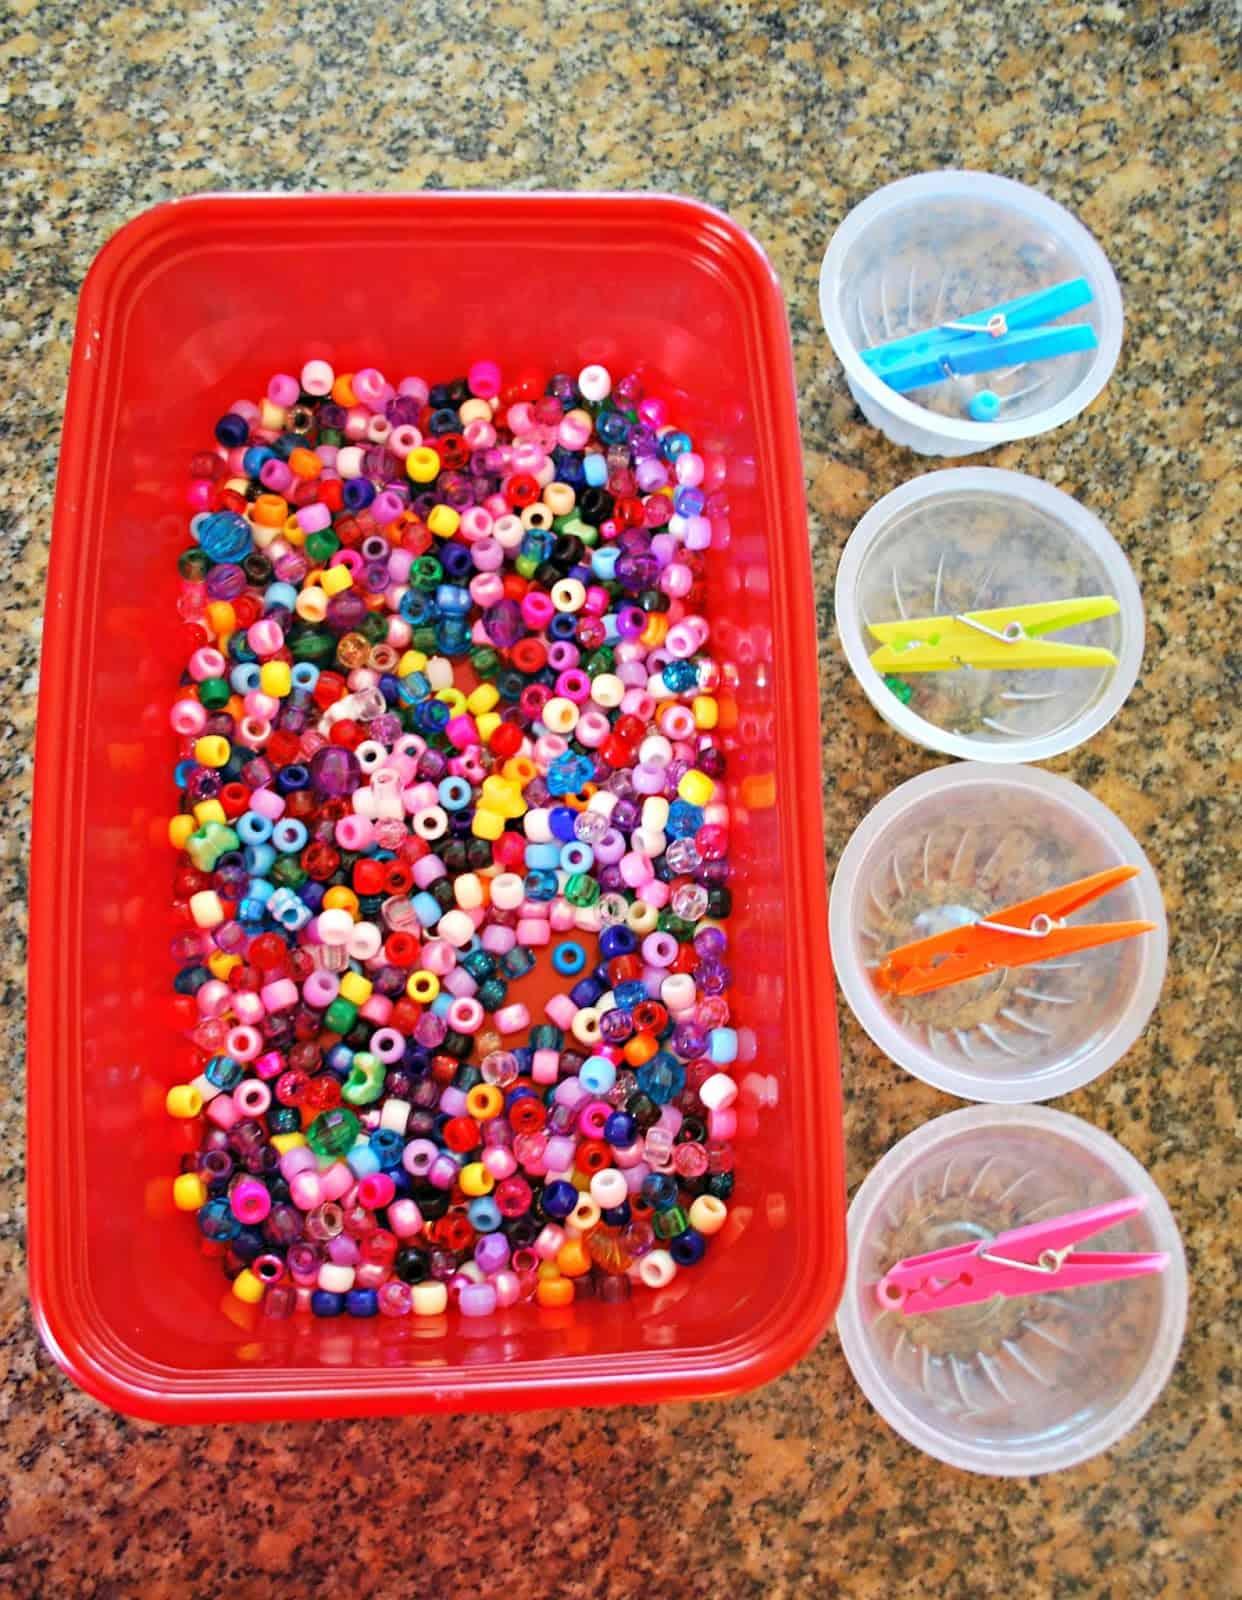 Fine Motor Skills Activity With Beads